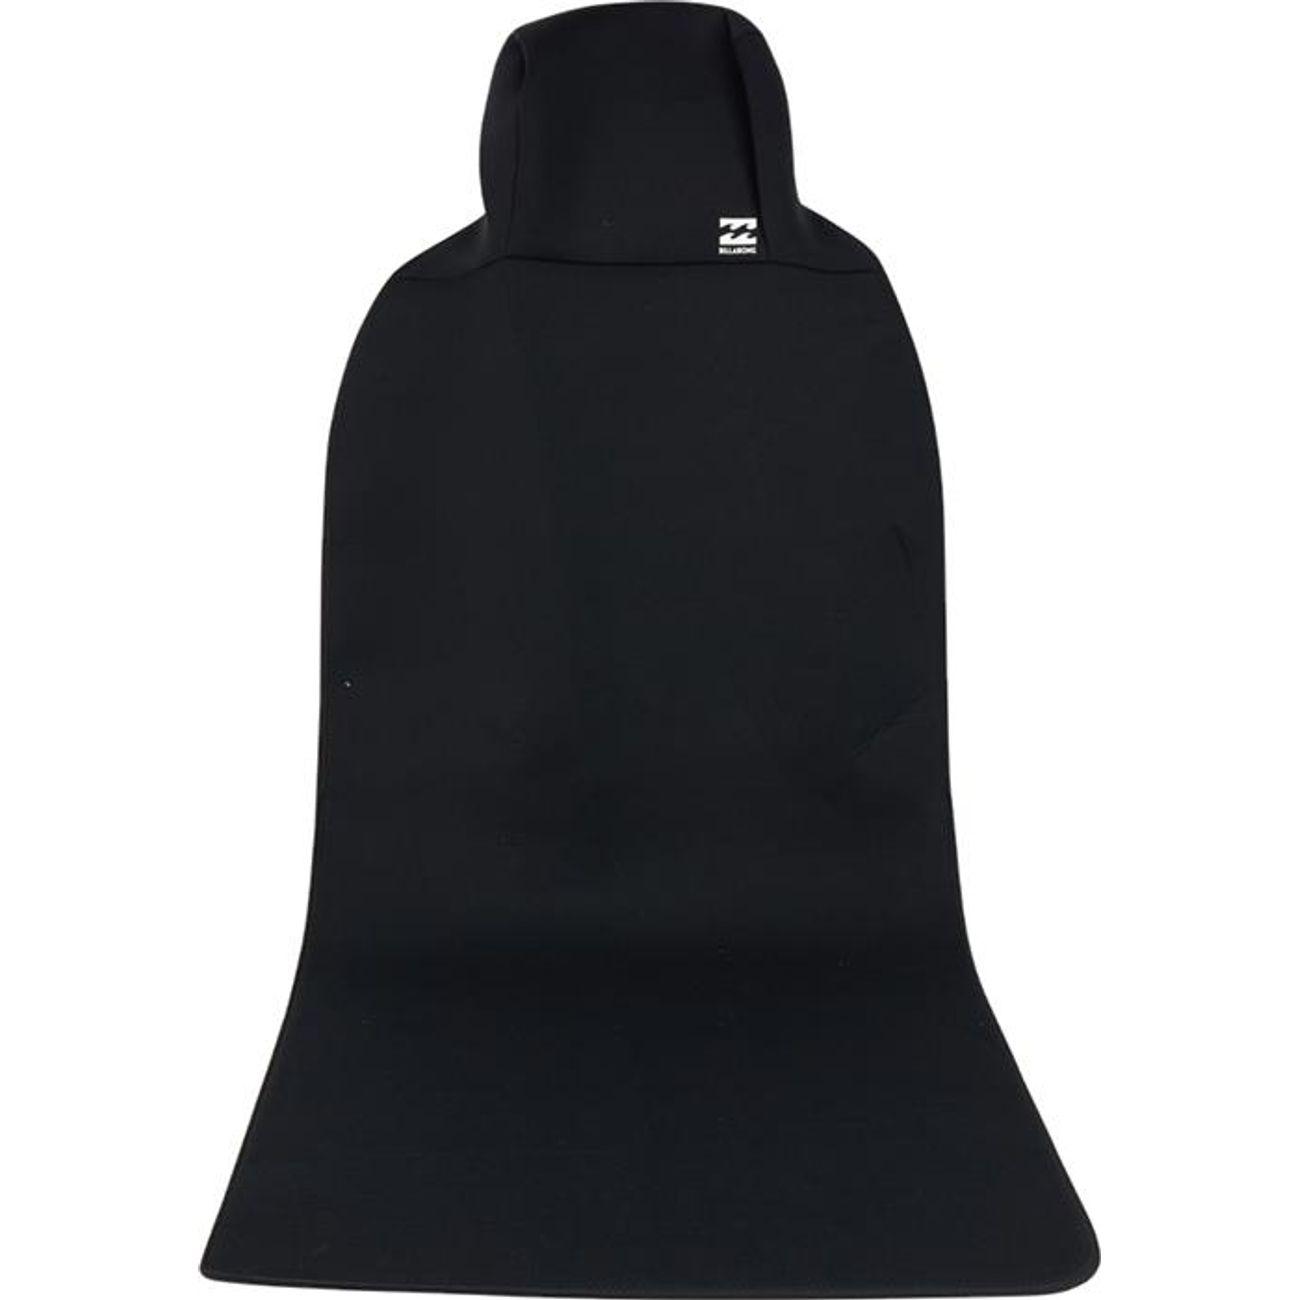 Multisport  BILLABONG Billabong 3mm Seat Cover Black U